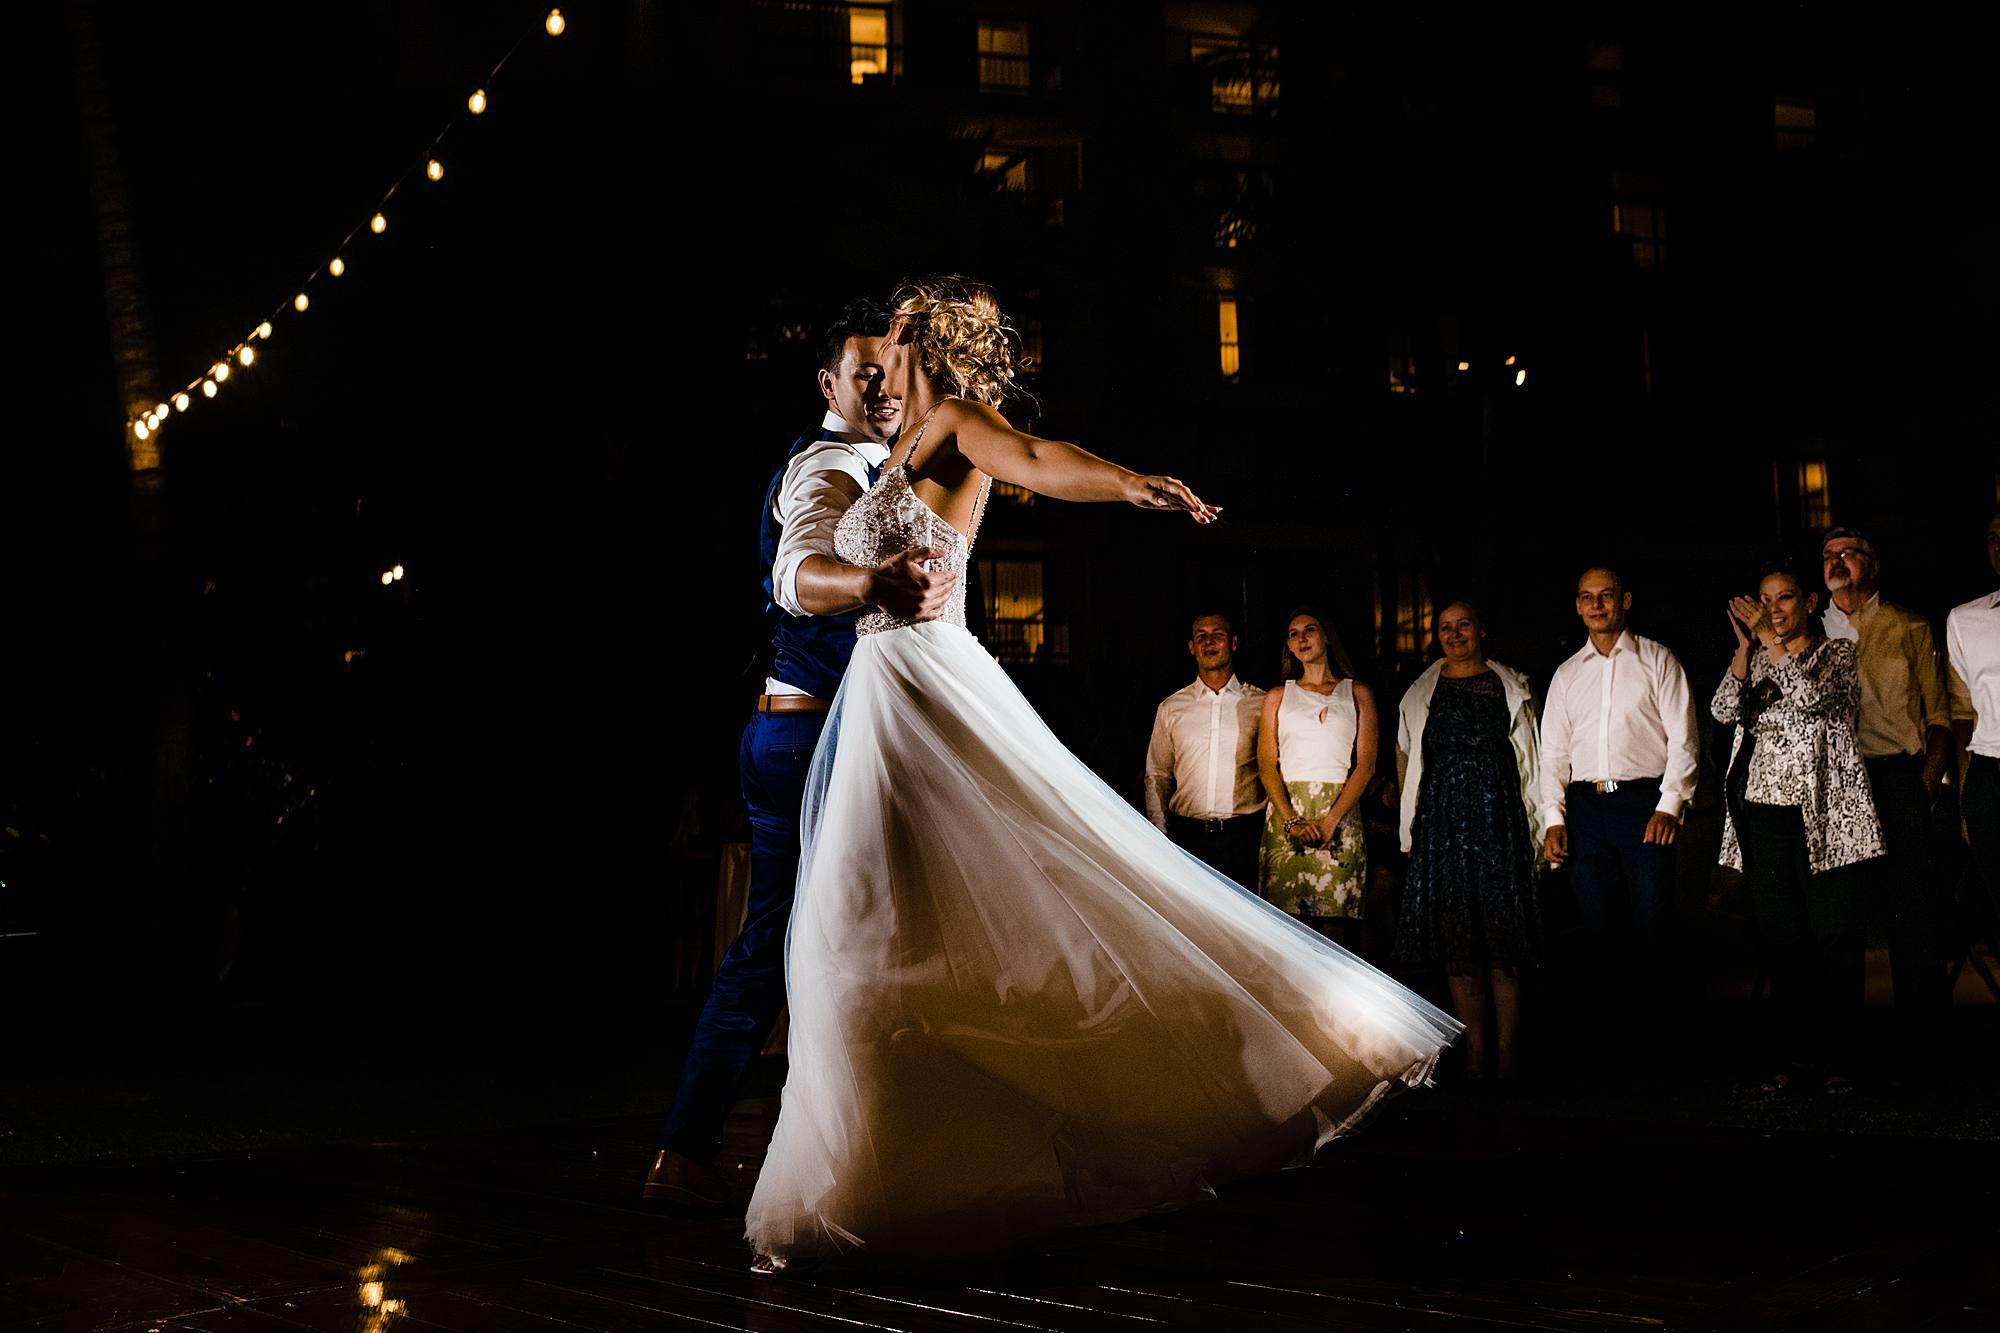 maui wedding photography prices - angela nelson photography_0007